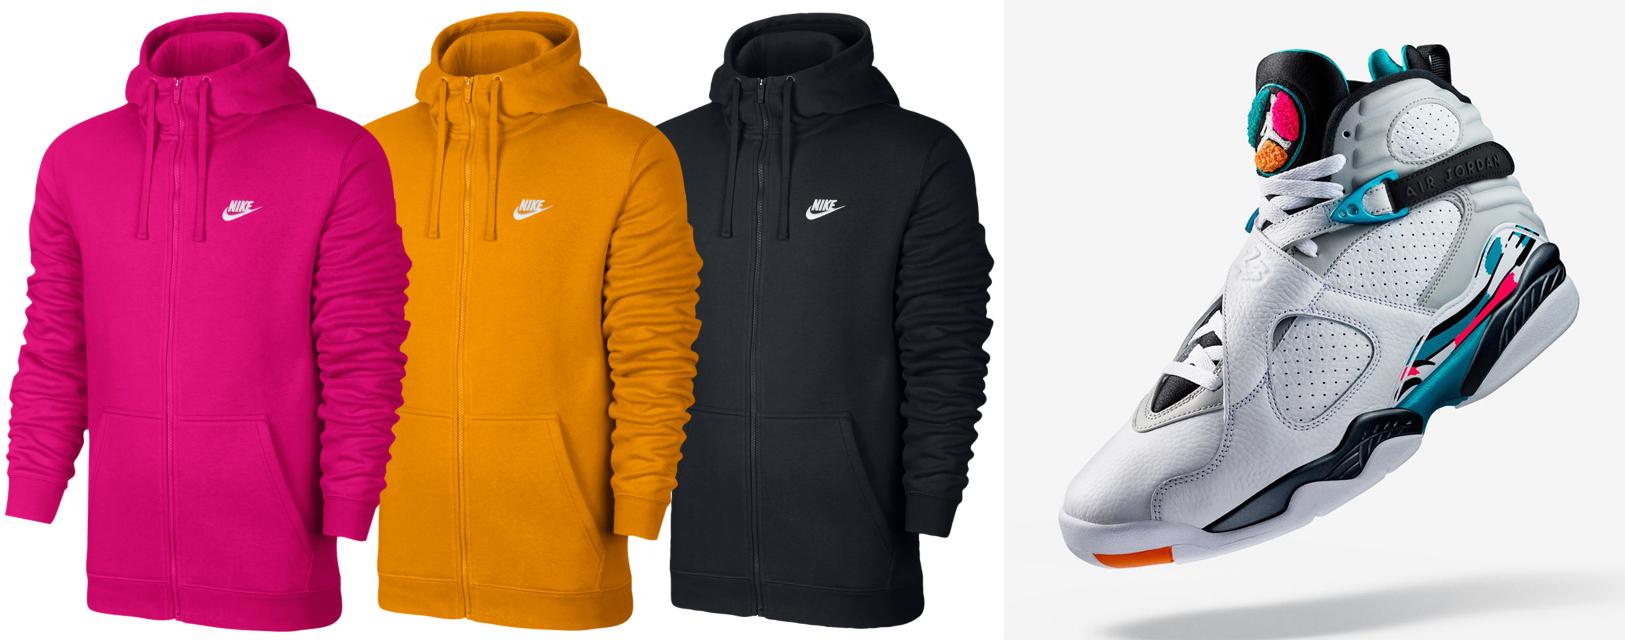 air-jordan-8-south-beach-nike-hoodies